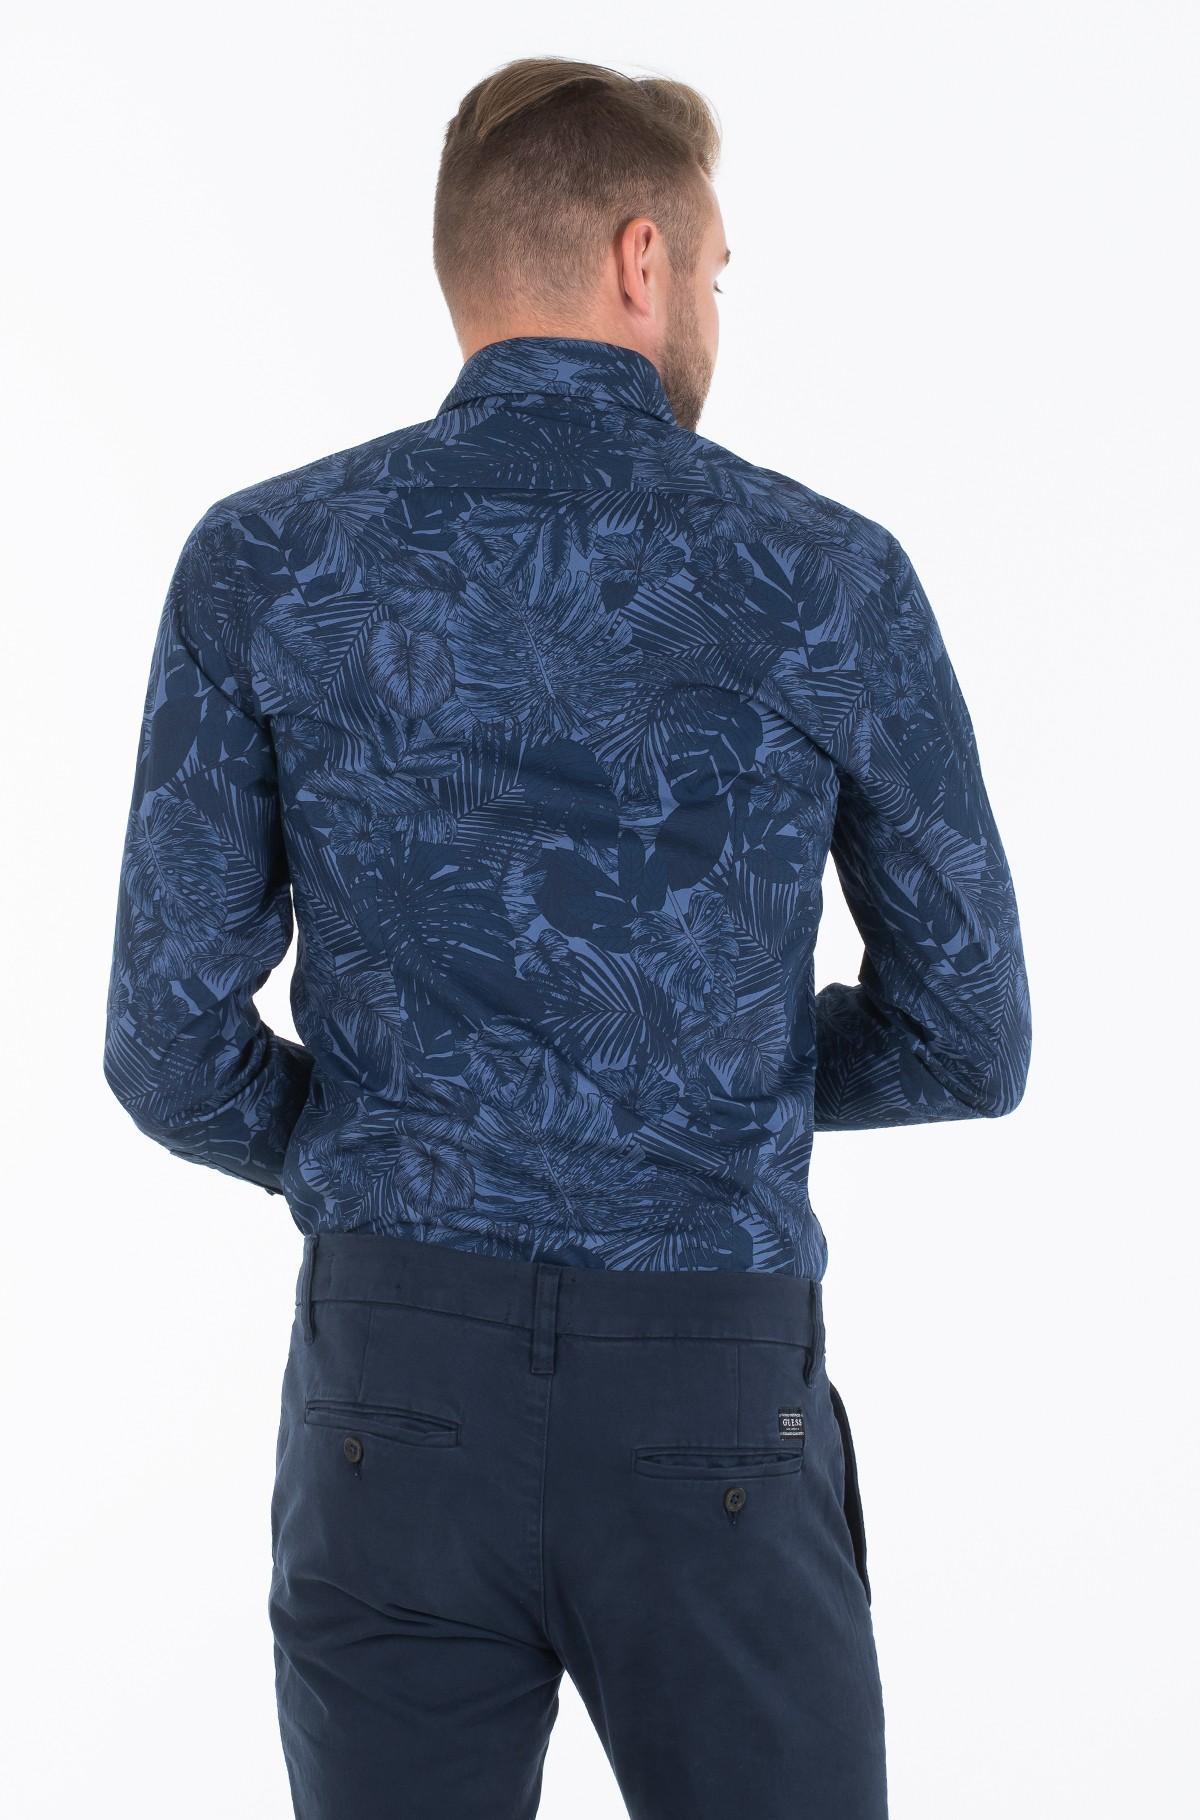 Marškiniai WASHED PRINT SLIM SHIRT-full-2